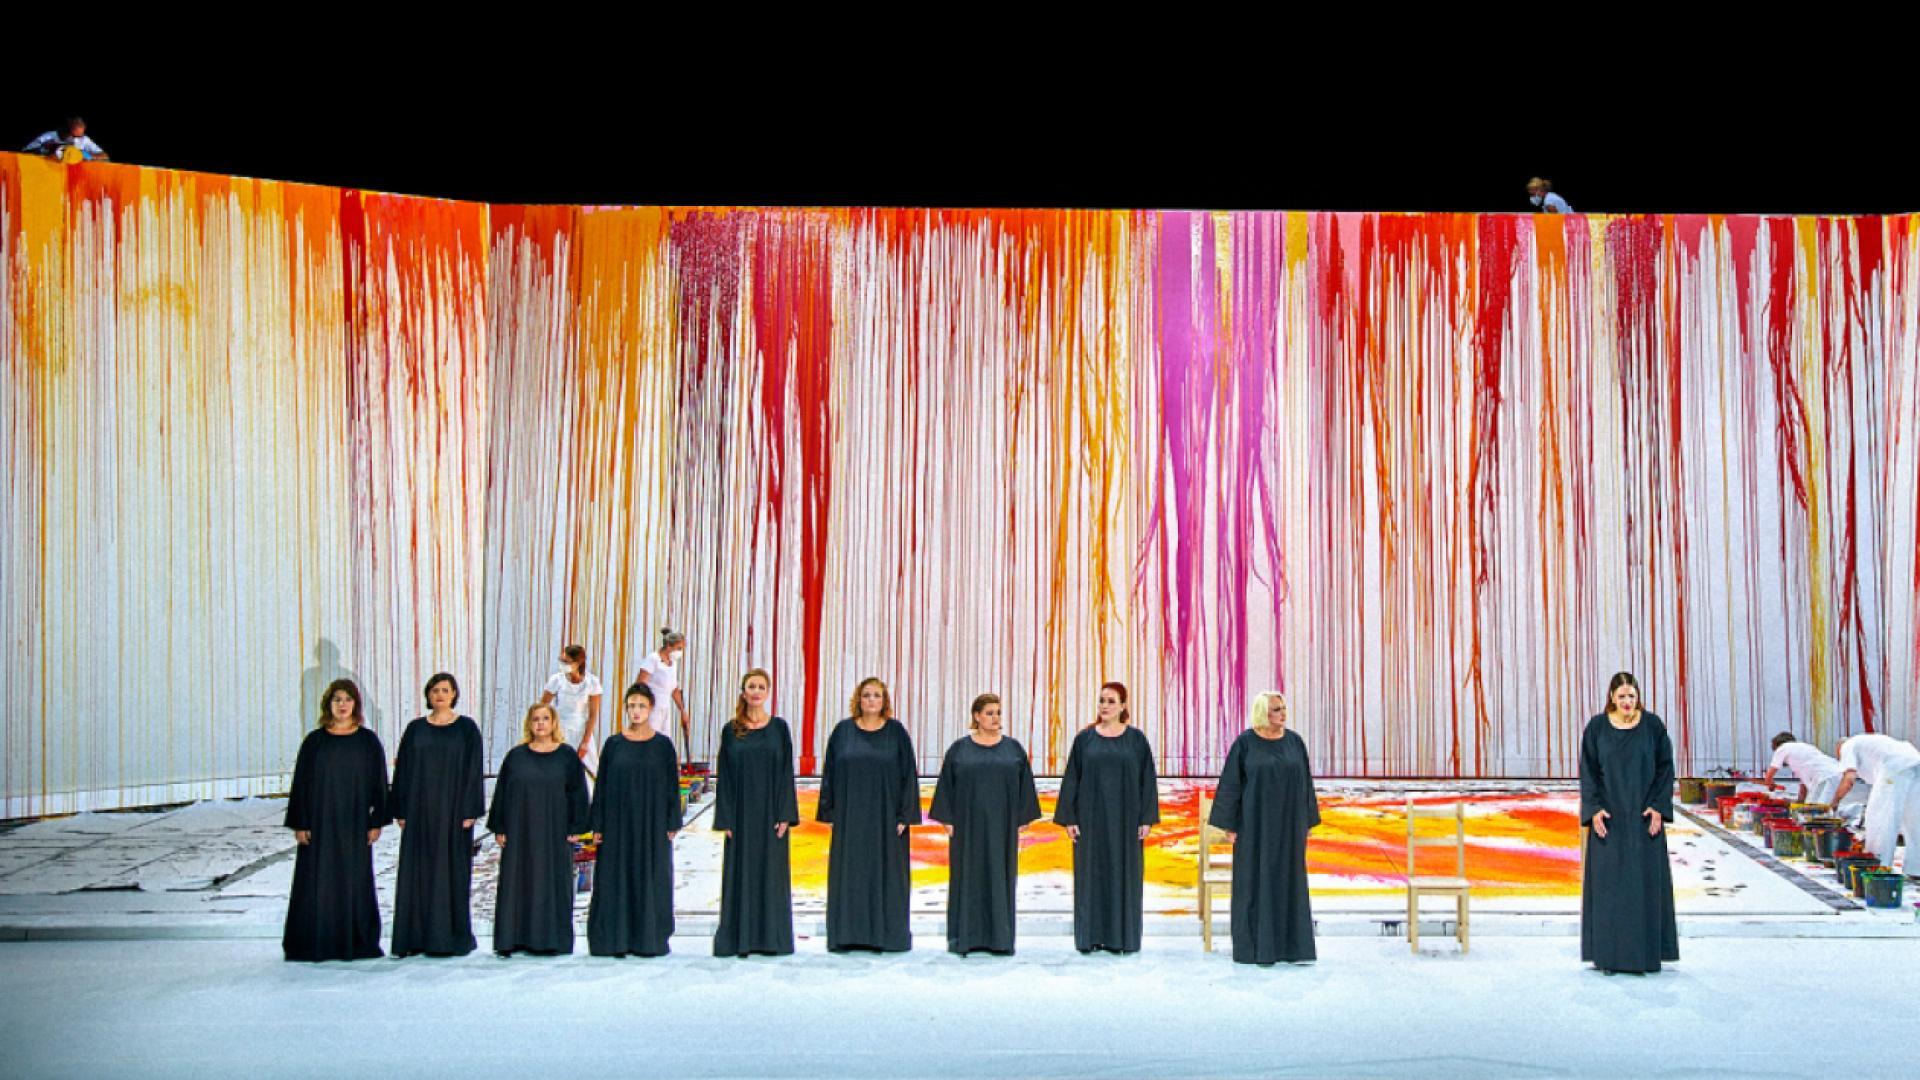 Nitsch and kitsch get booed at Bayreuth